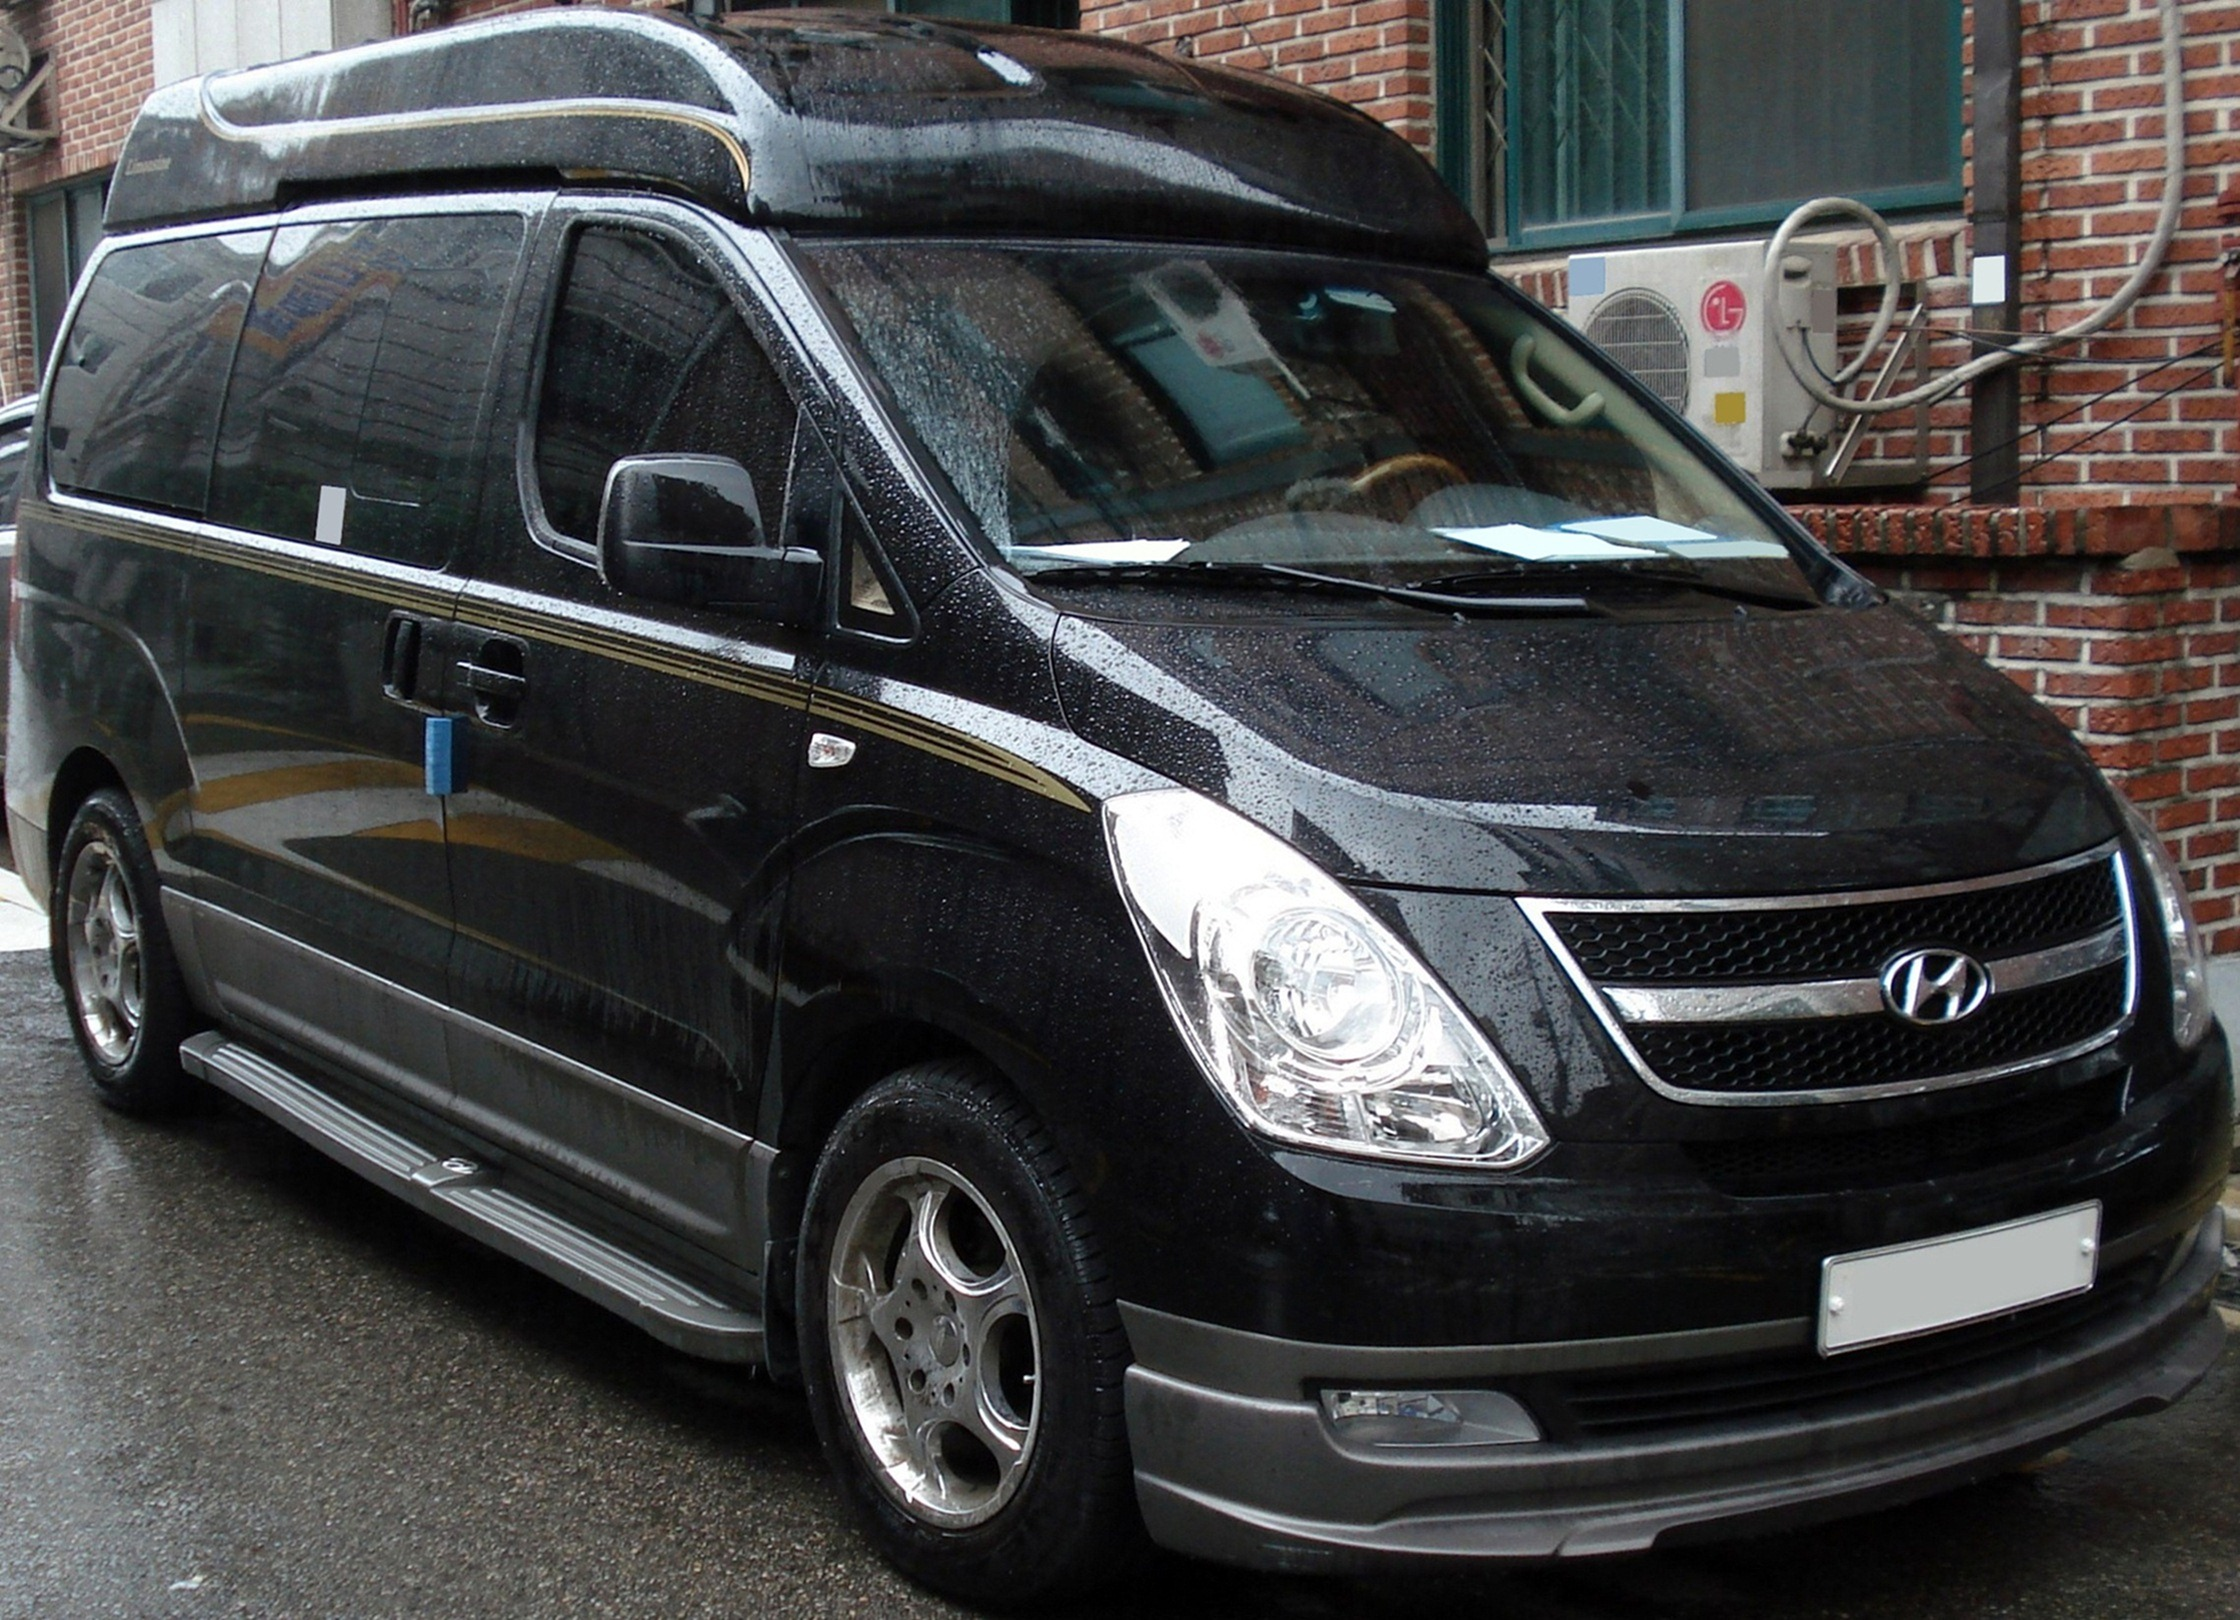 hyundai h-1 starex 2010 limousine